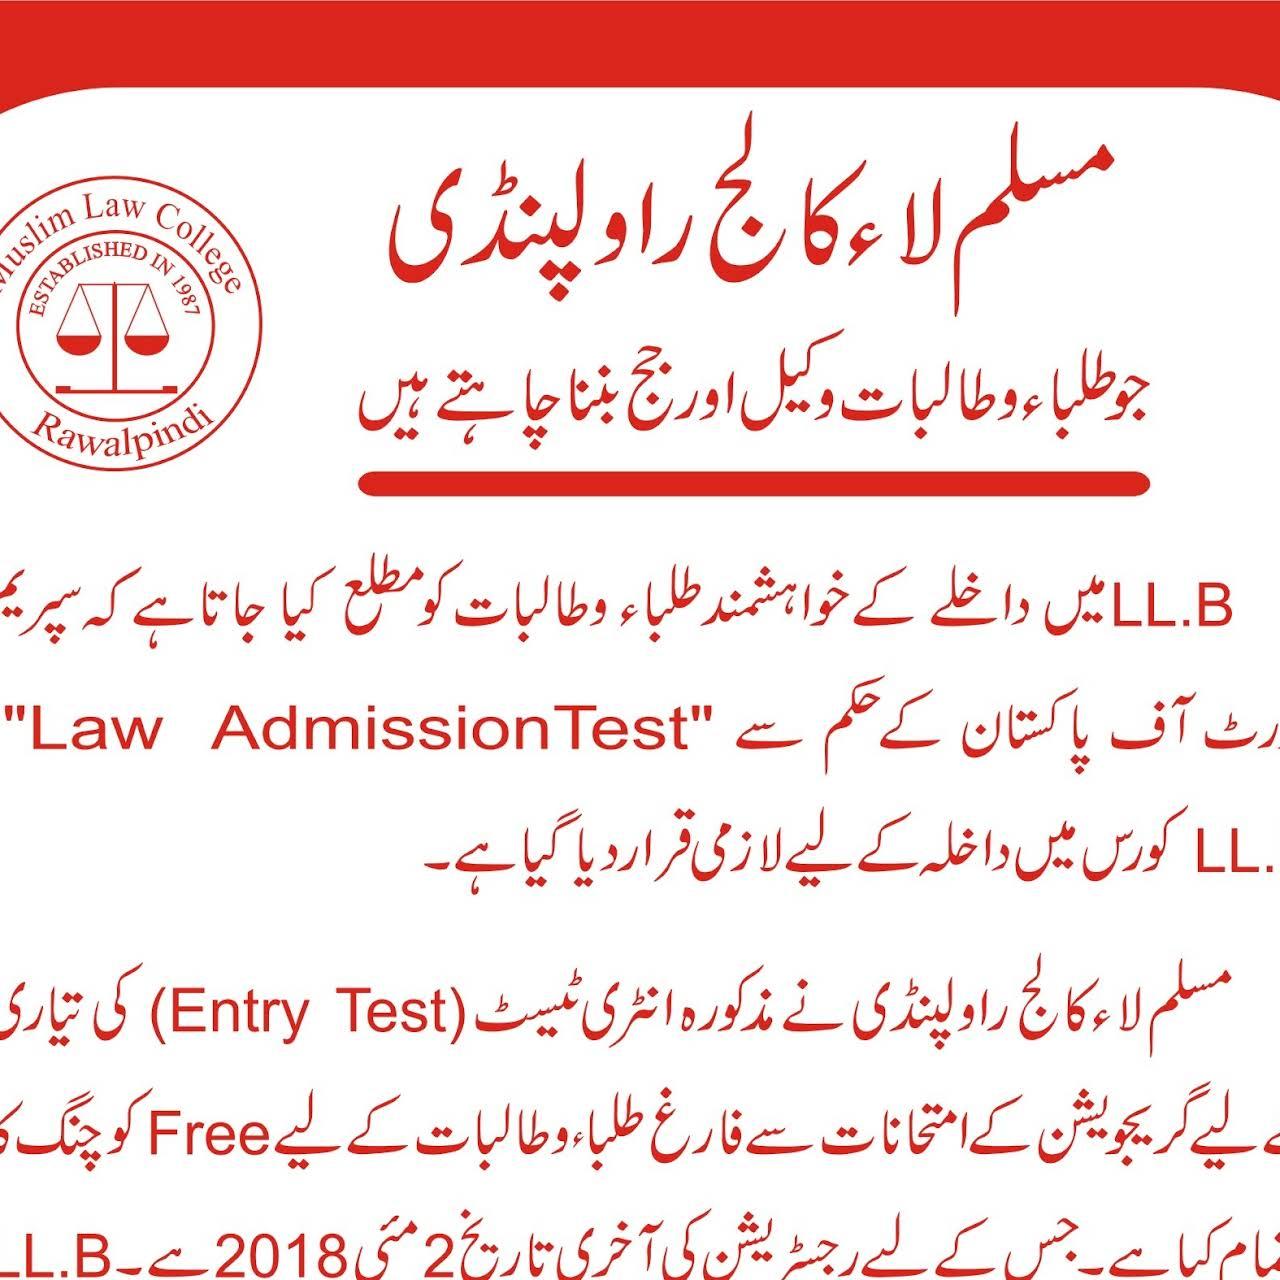 Muslim Law College, 6th Road near HBL, A Block Satellite Town